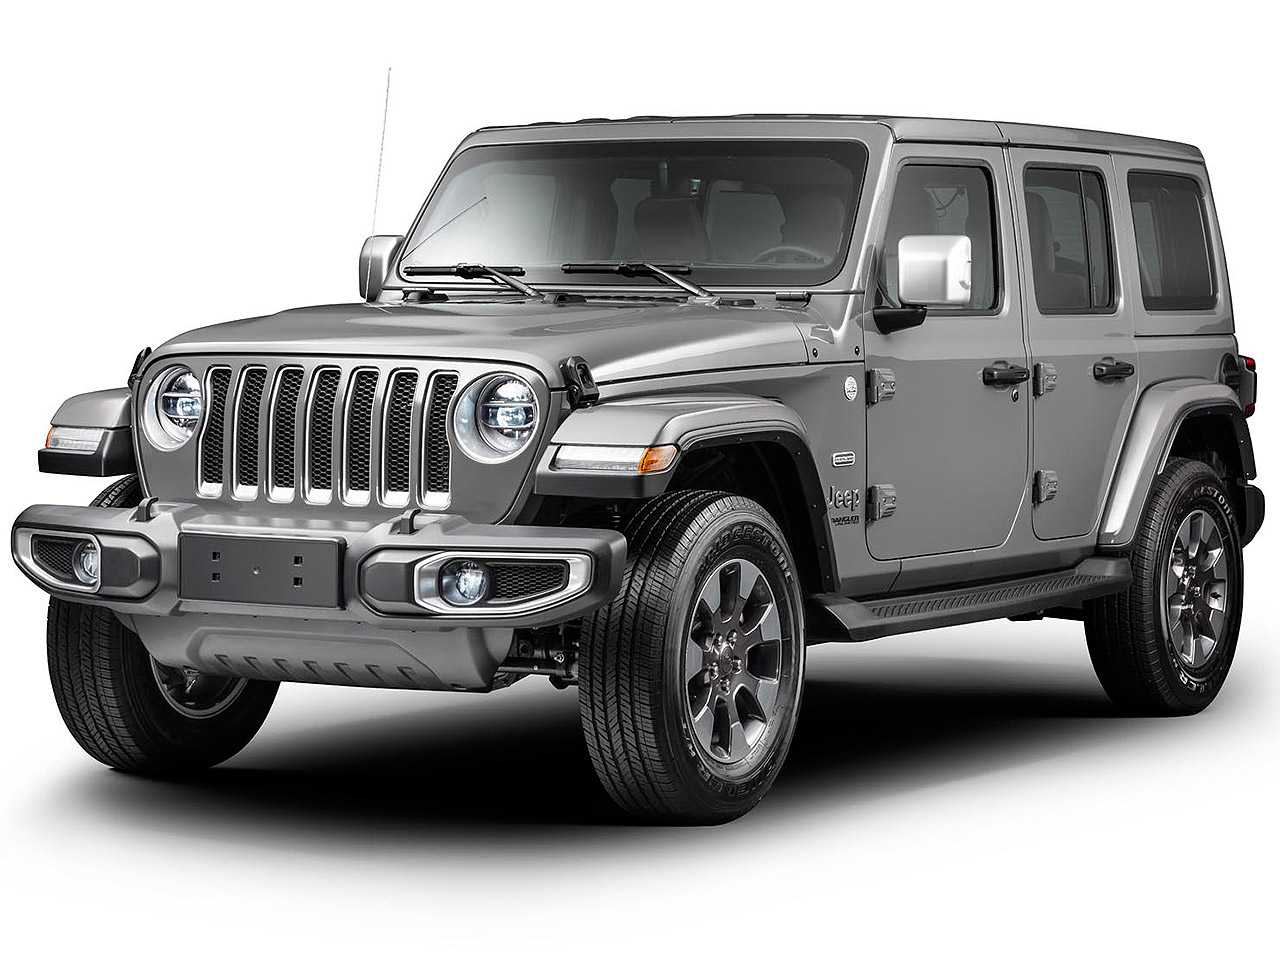 Jeep Wrangler Sahara Unlimited Overland